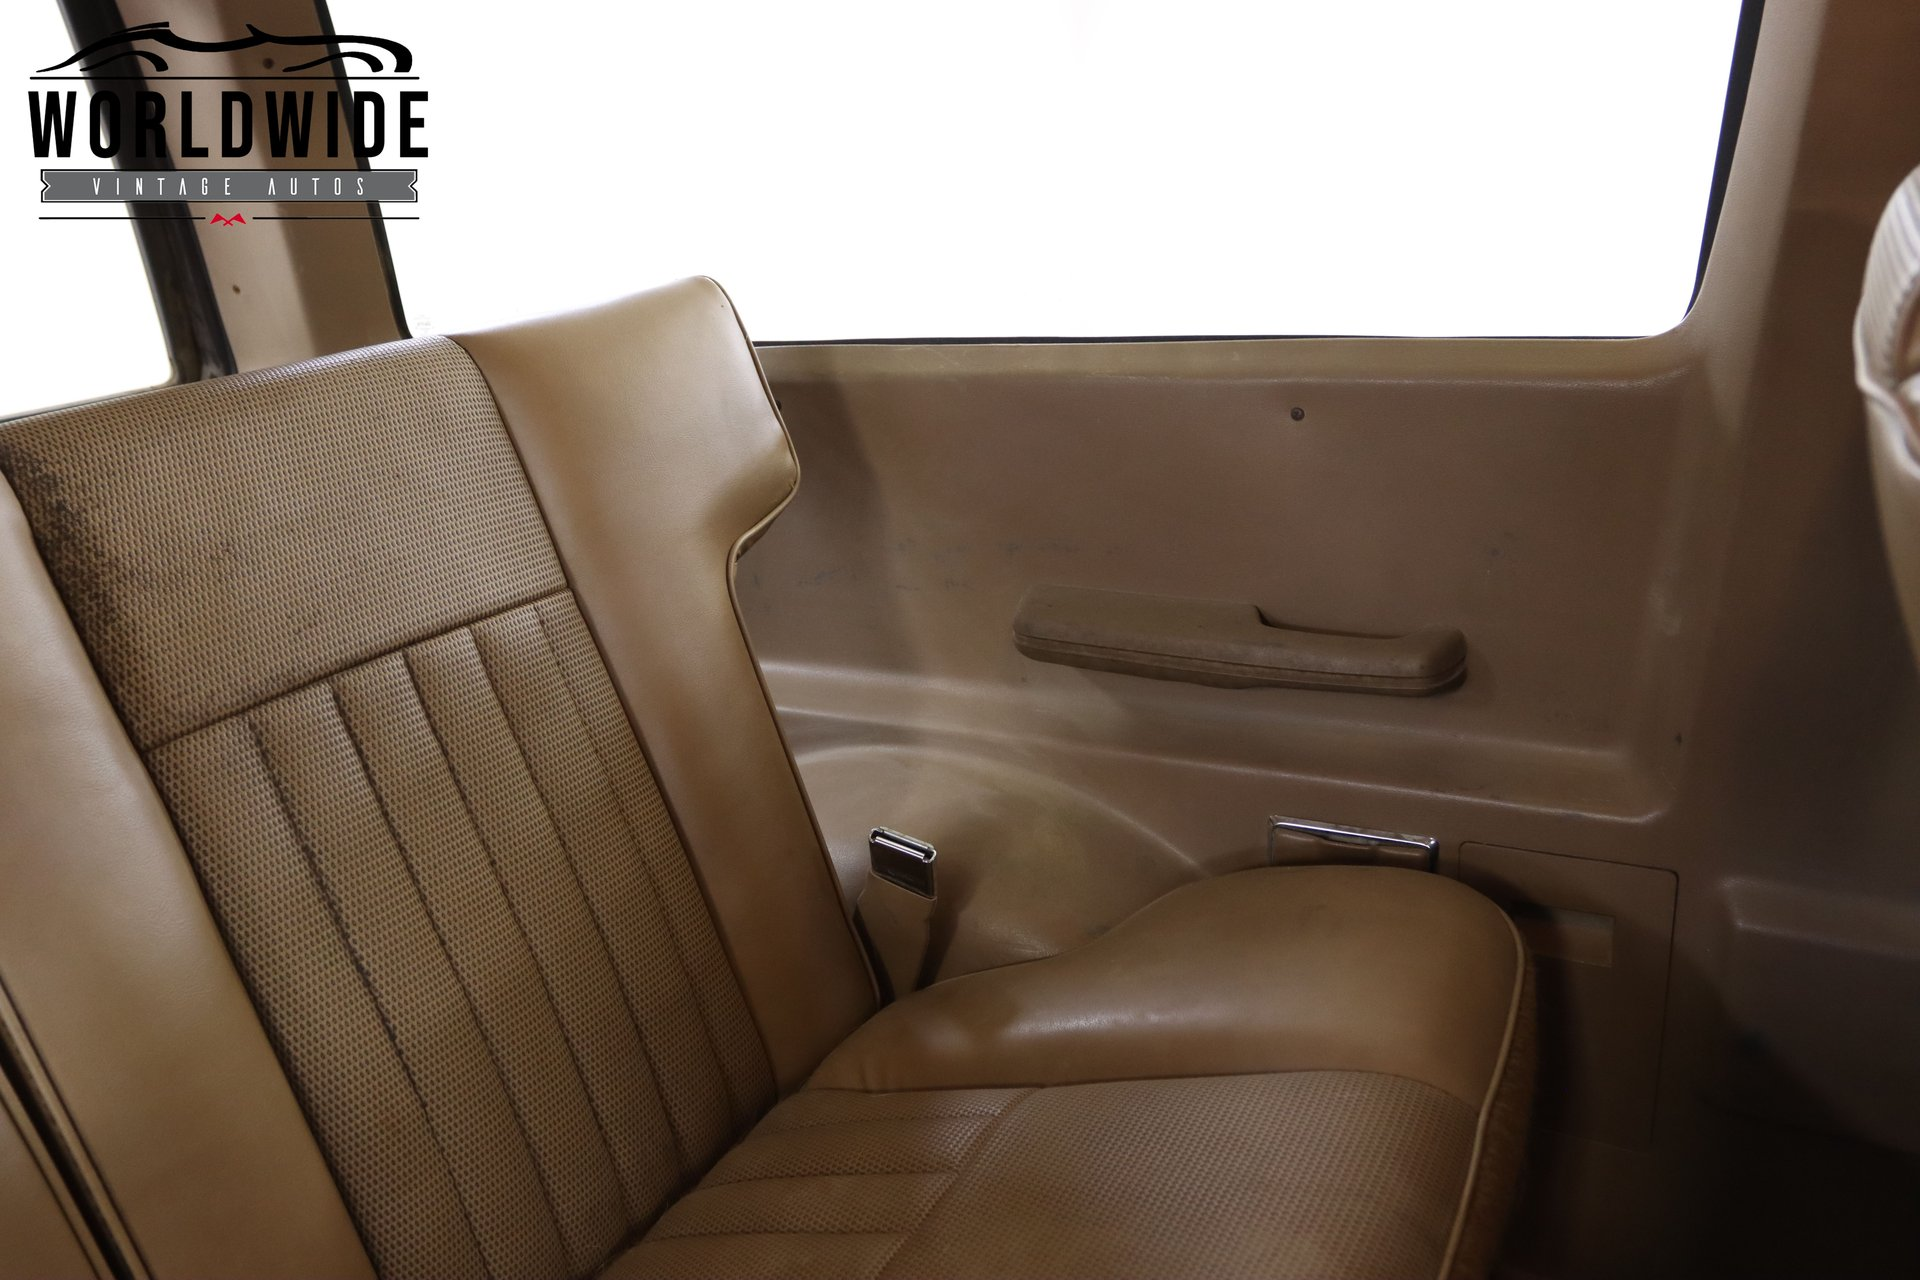 1987 Ford Bronco II